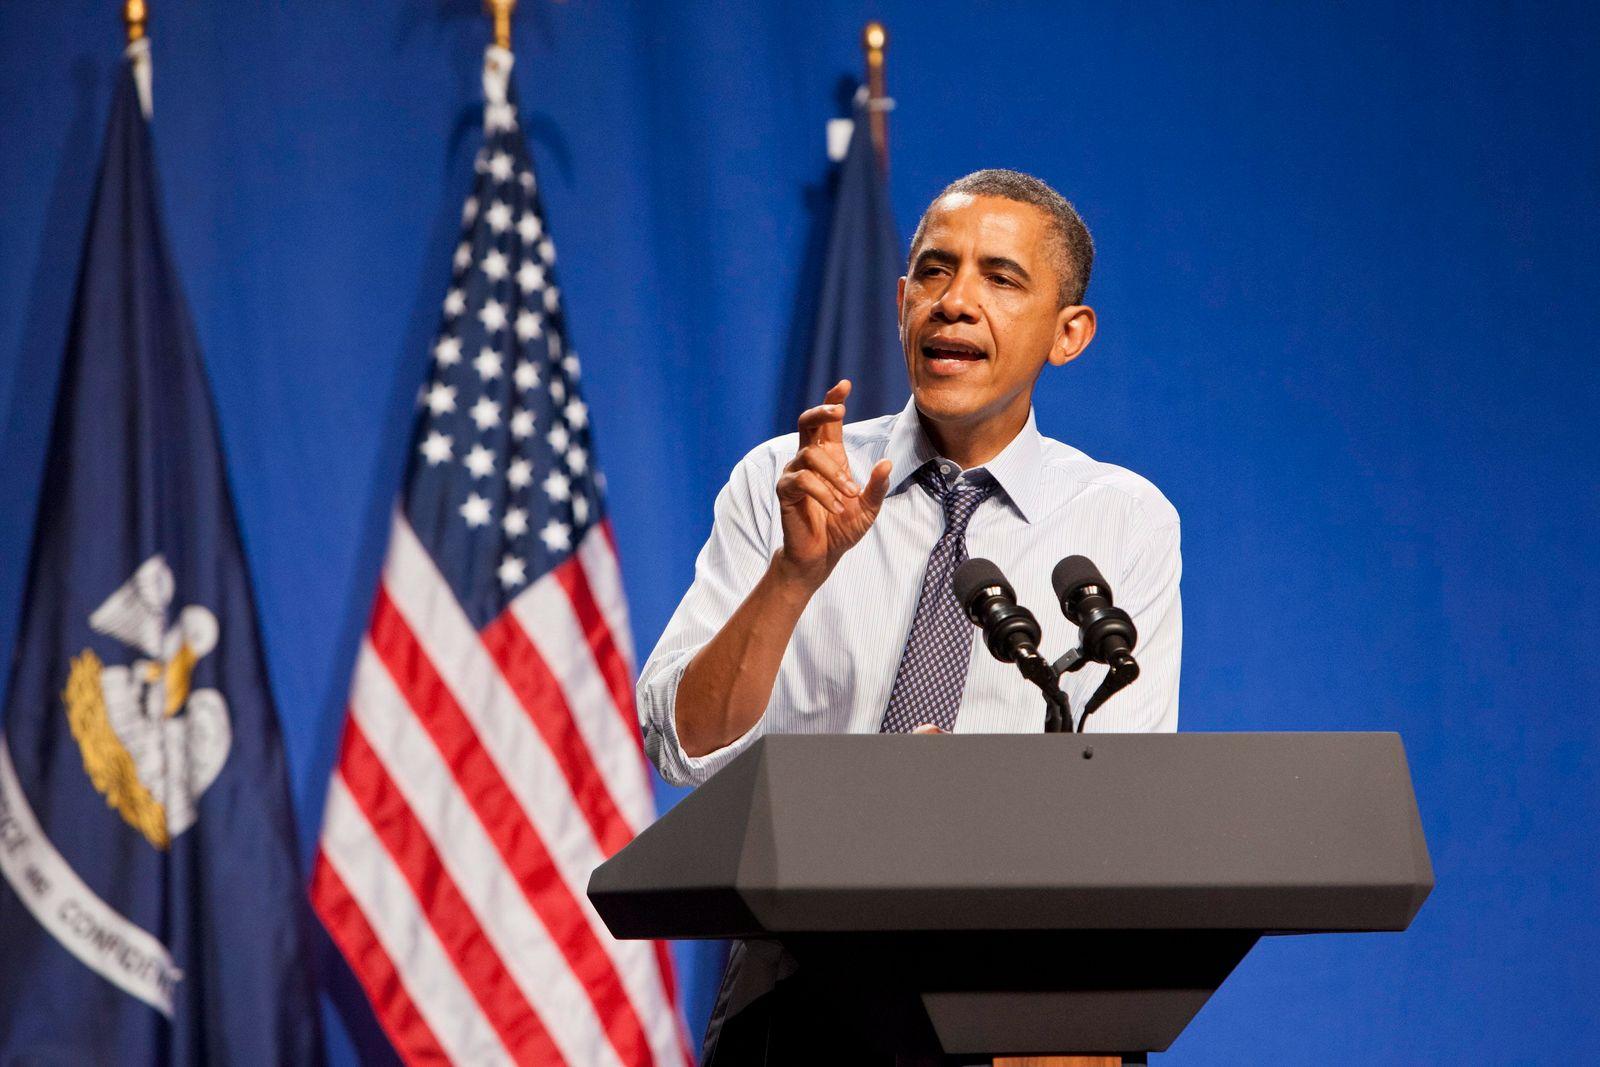 US President Barack Obama in New Orleans